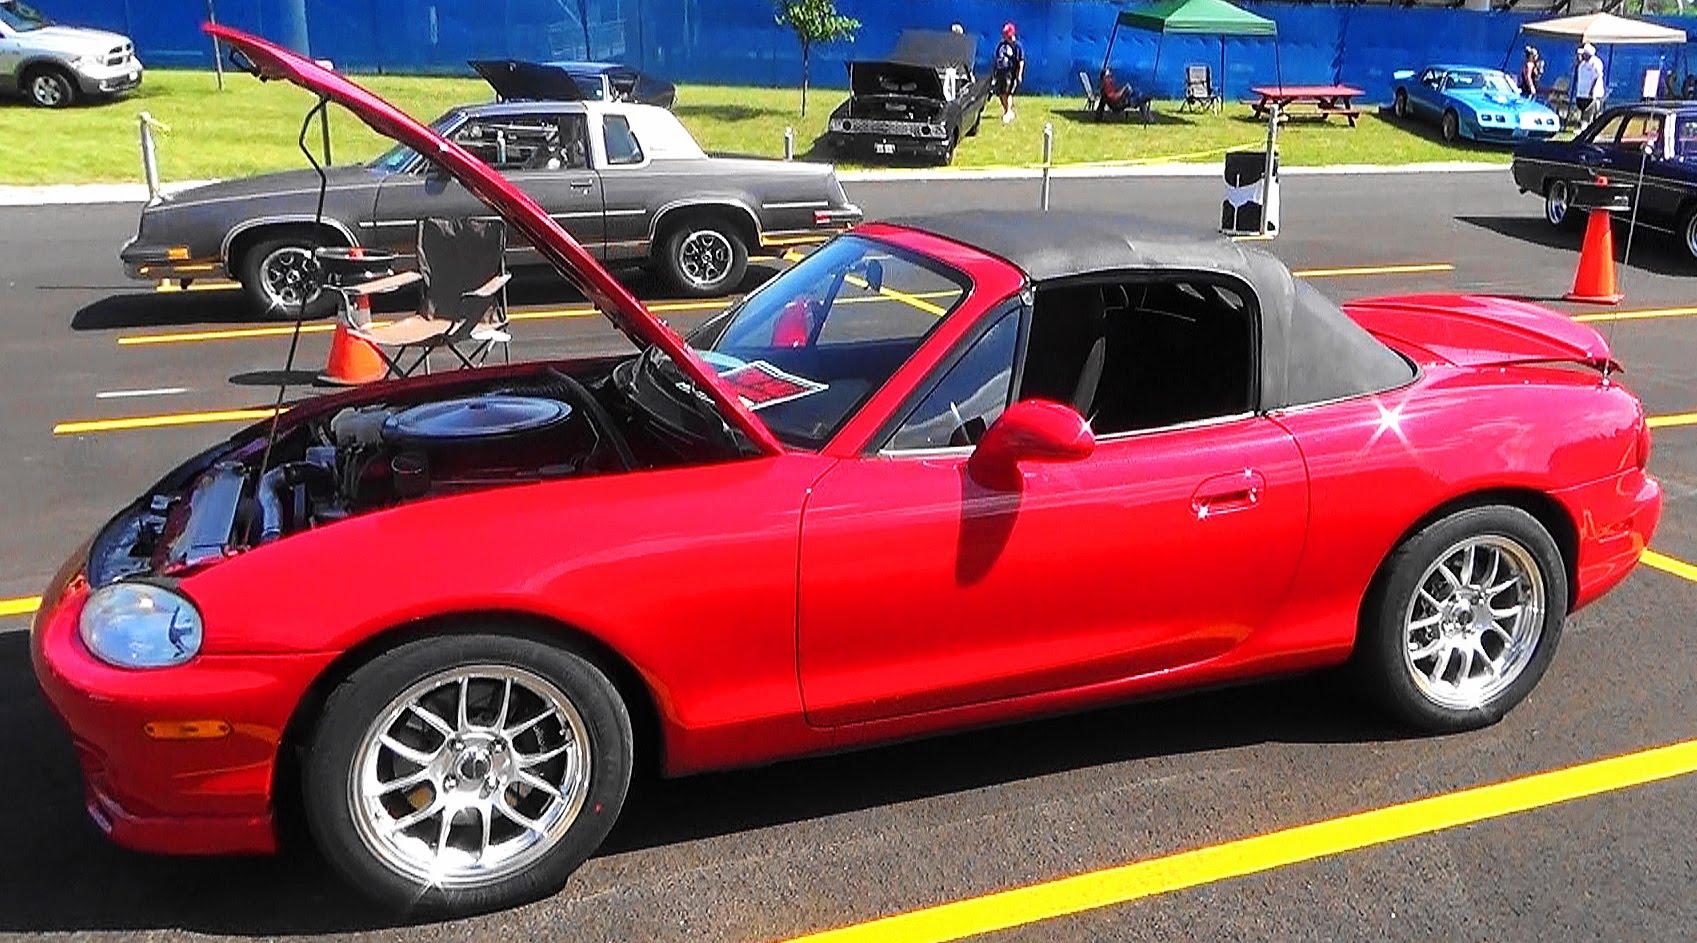 1999 Mazda Miata Ford V8 2015 Car Craft Summer Nationals - ScottieDTV - Coolest Cars On The Web